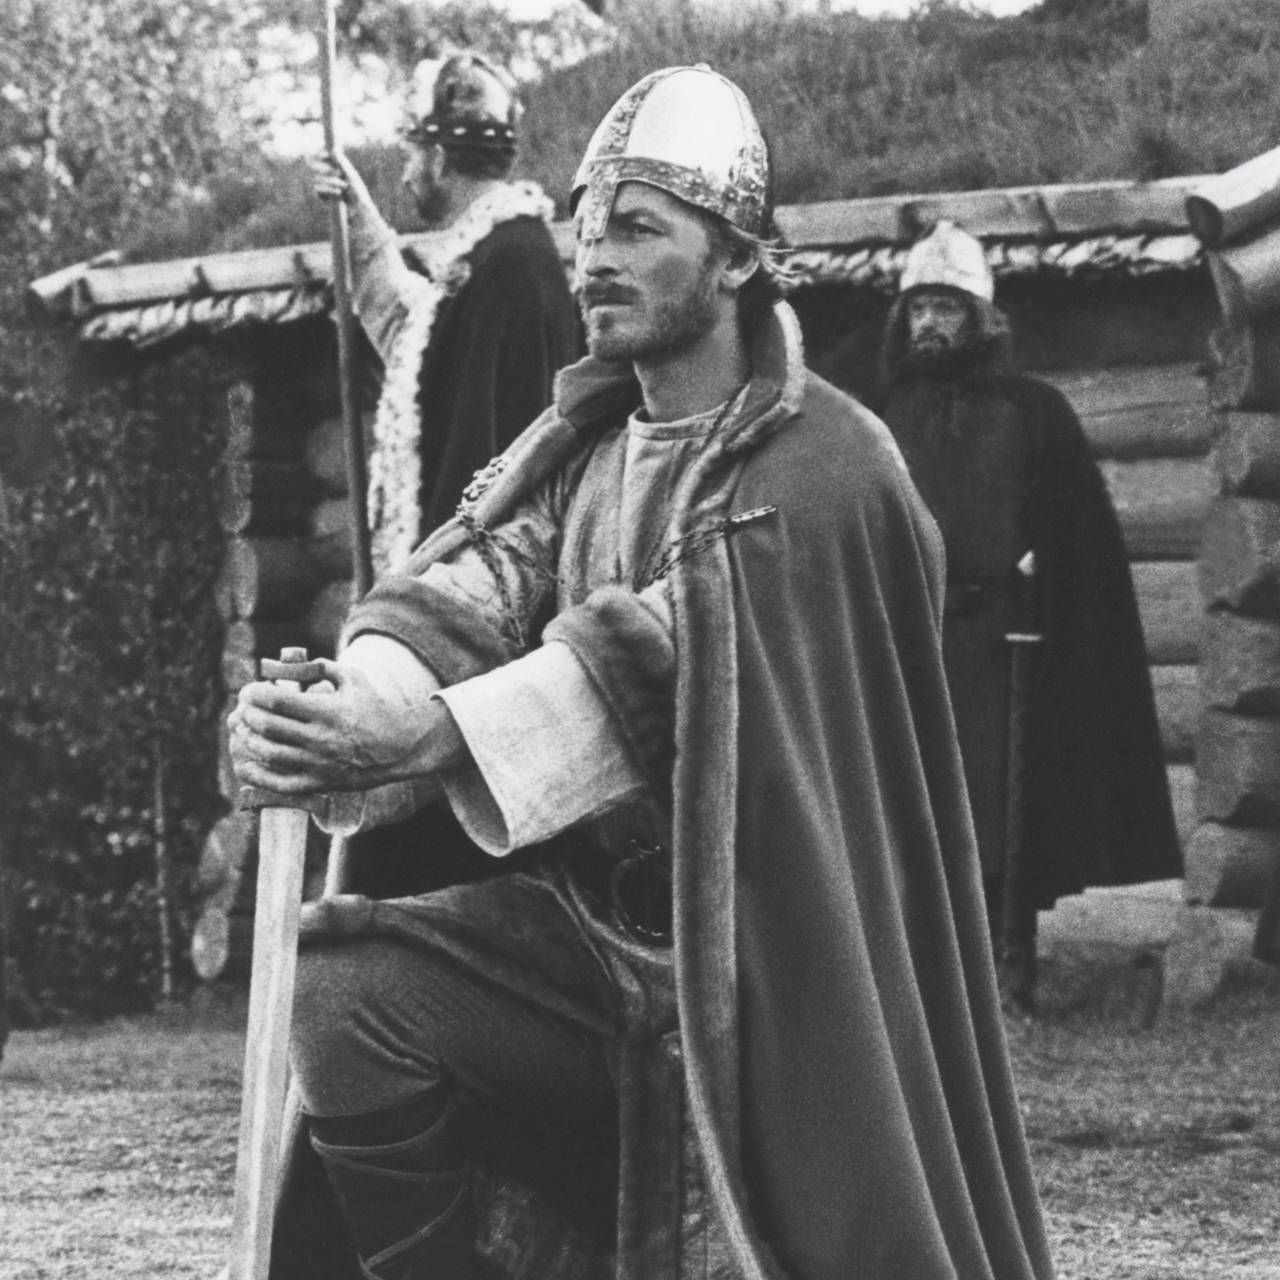 Erik Hivju spilte konge på Stiklestad i 1979.